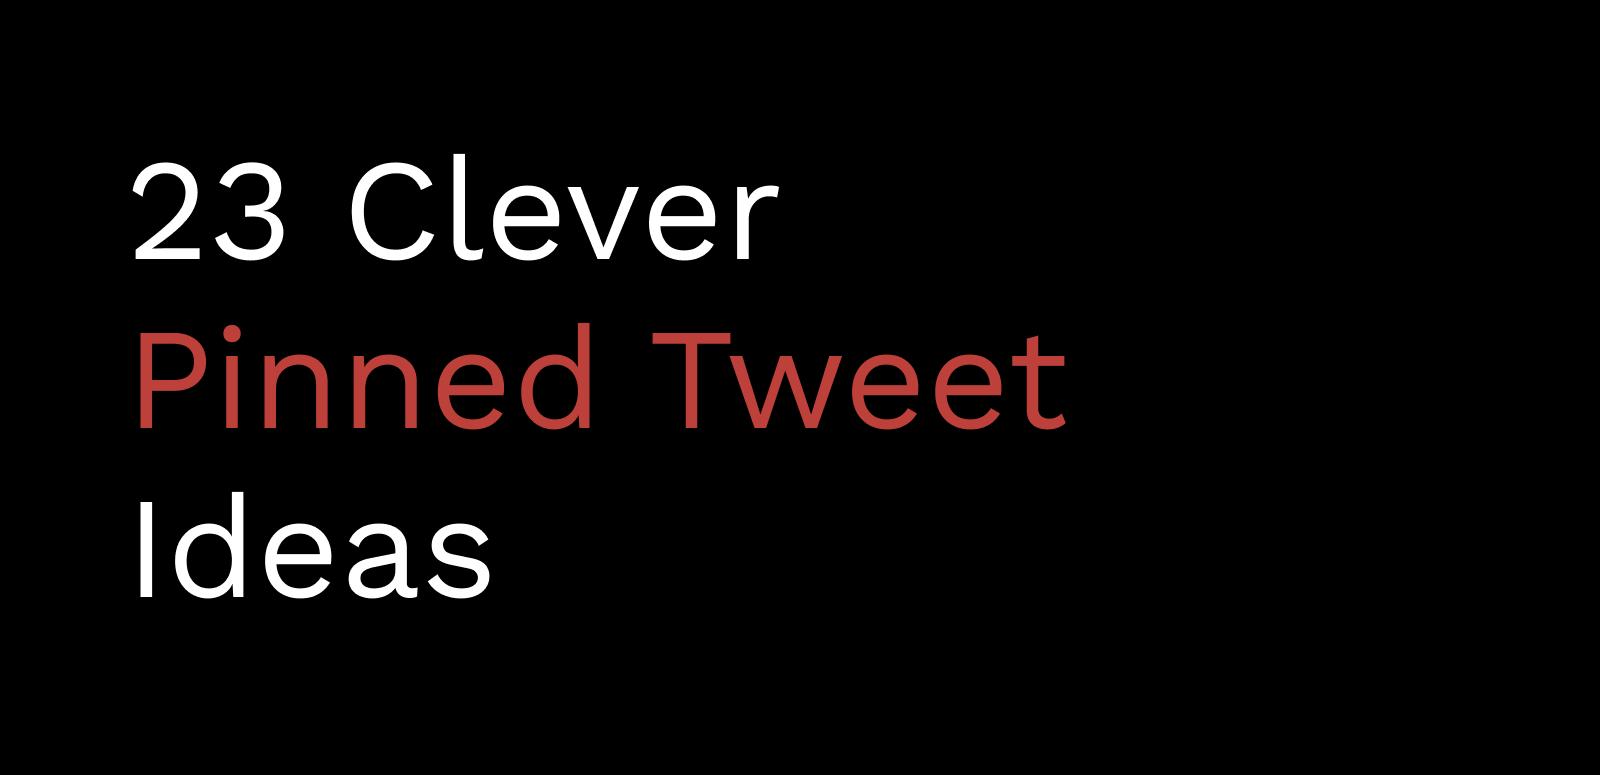 23 Clever Pinned Tweet Ideas